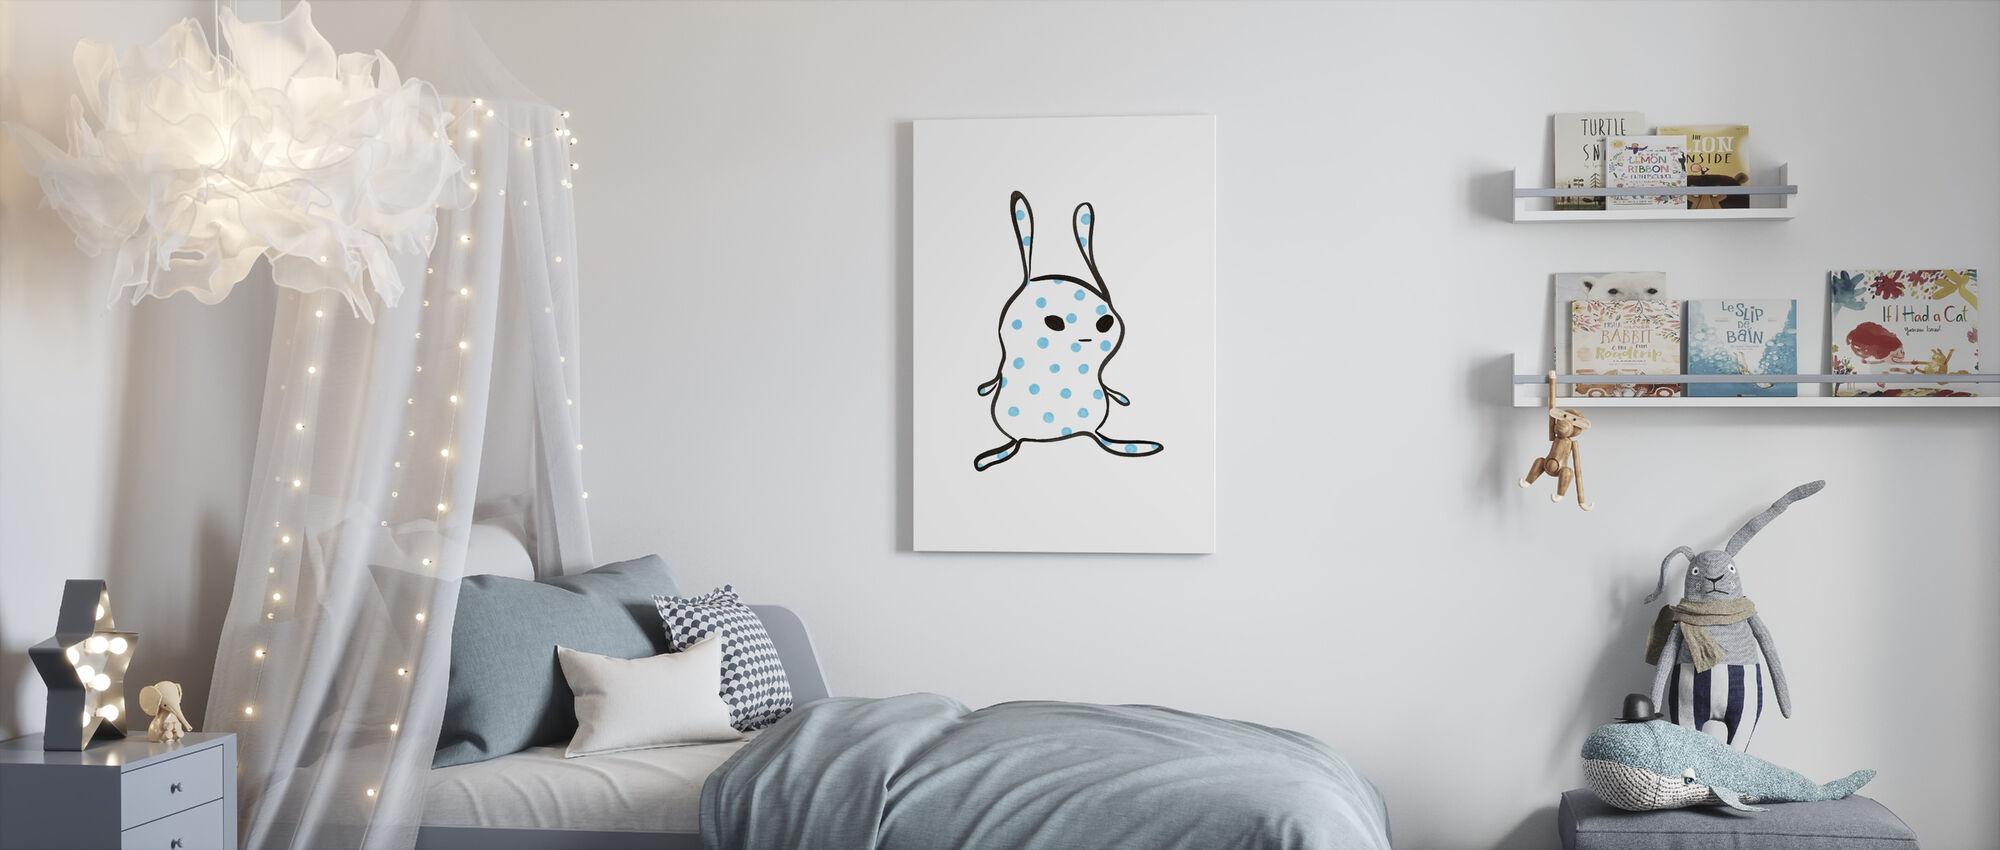 Bump - Canvas print - Kids Room